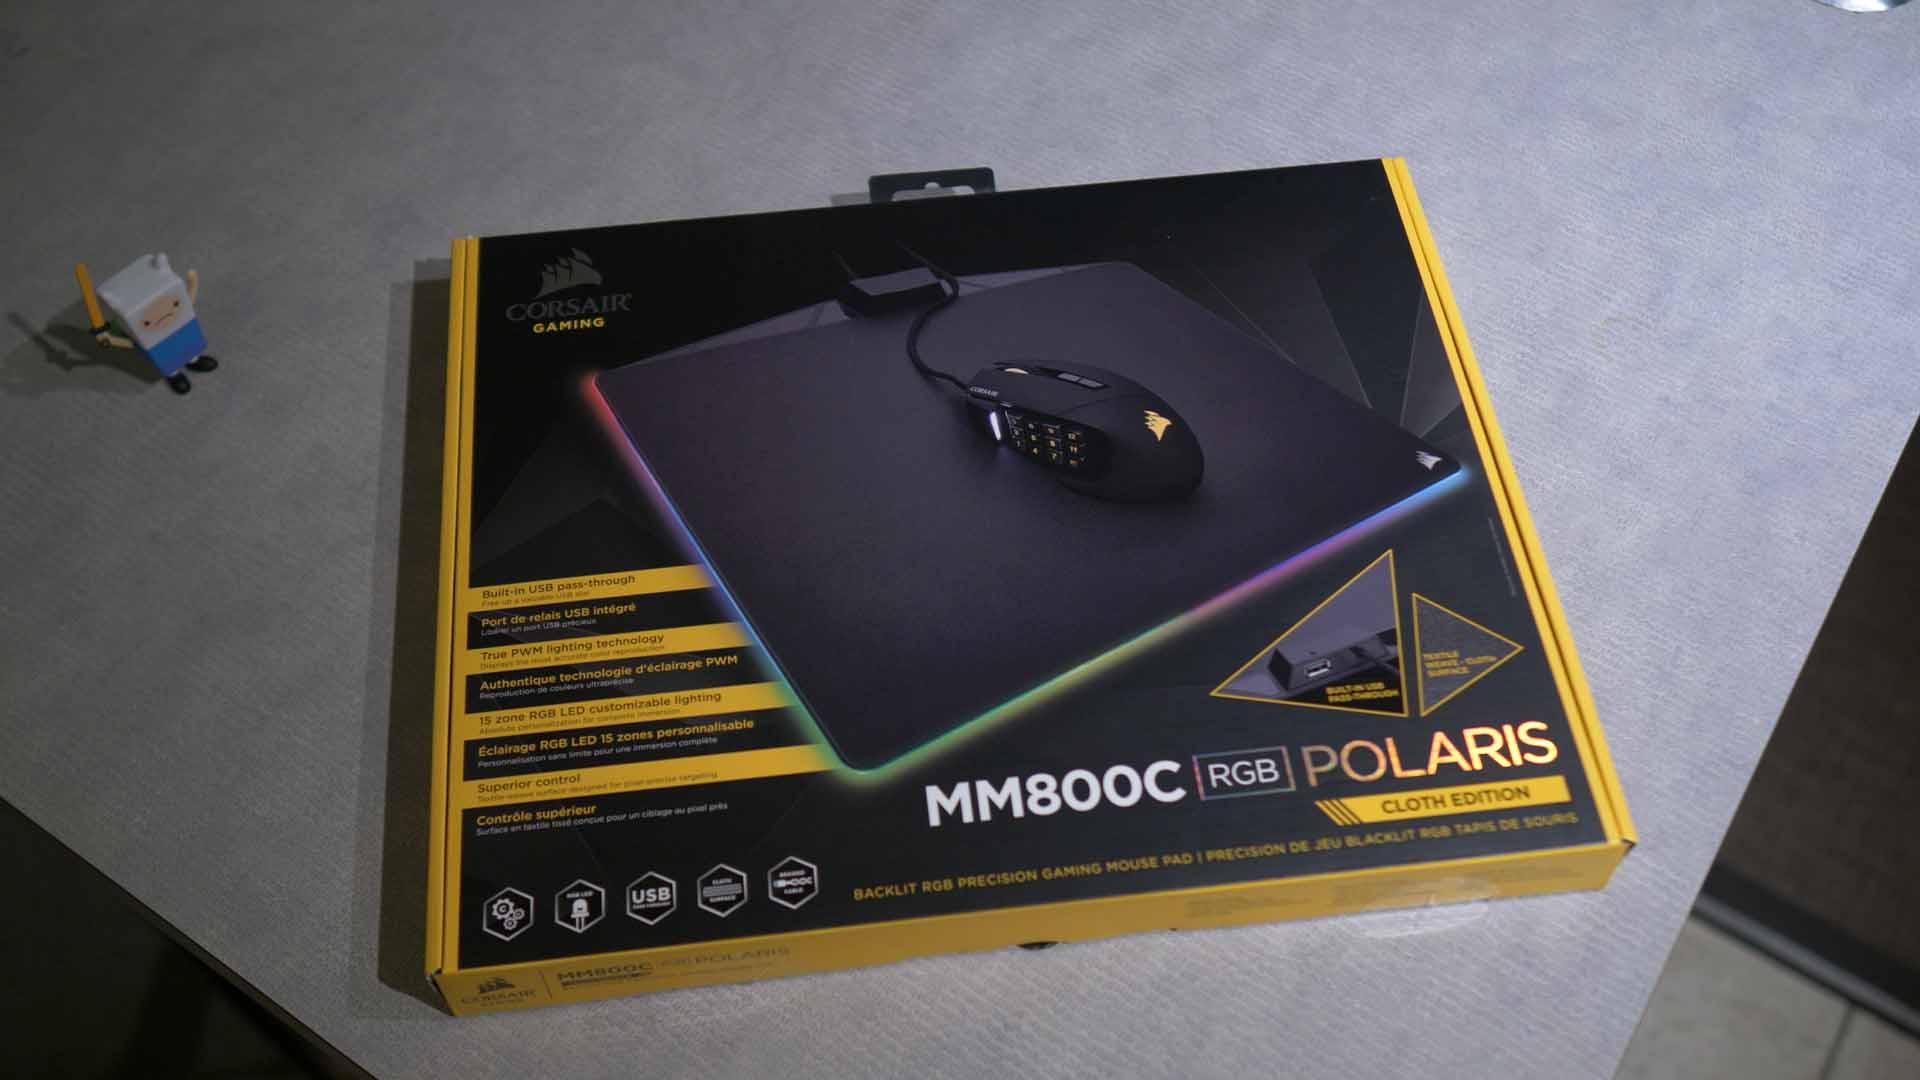 Unboxing MM800C - Corsair MM800C Mousepad Review - RGB Overload?